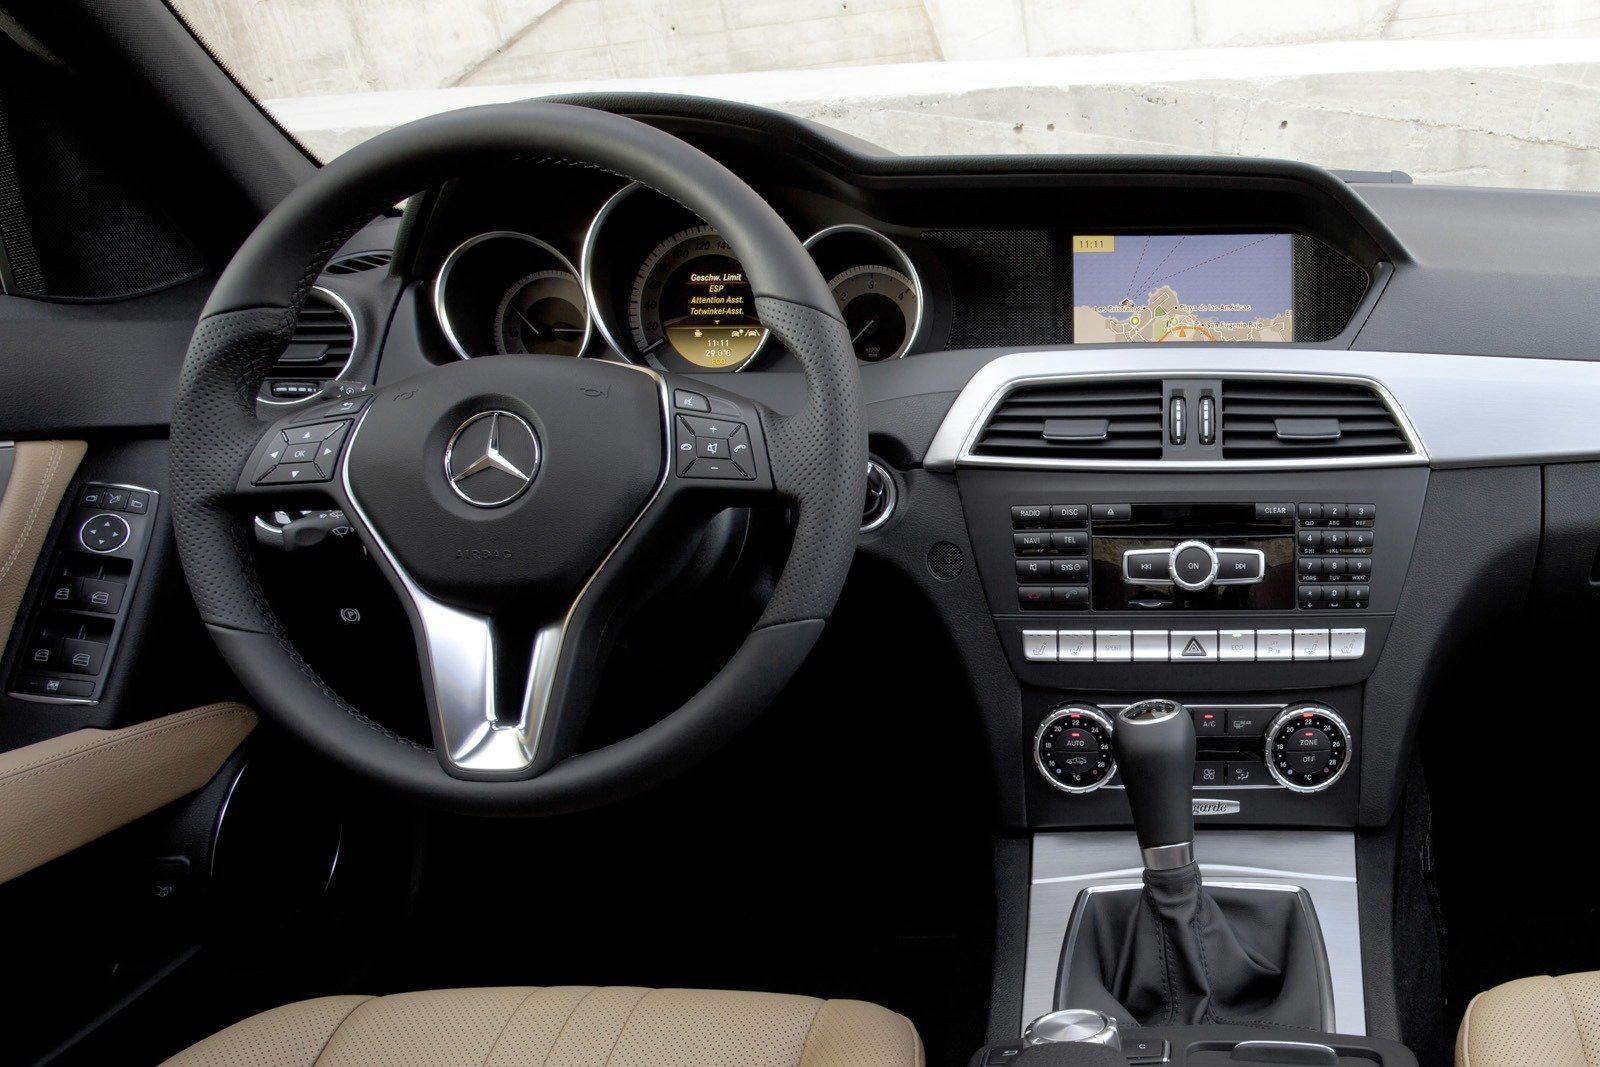 2014 c w205 mercedes c class w204 - 2014 mercedes c class interior ...